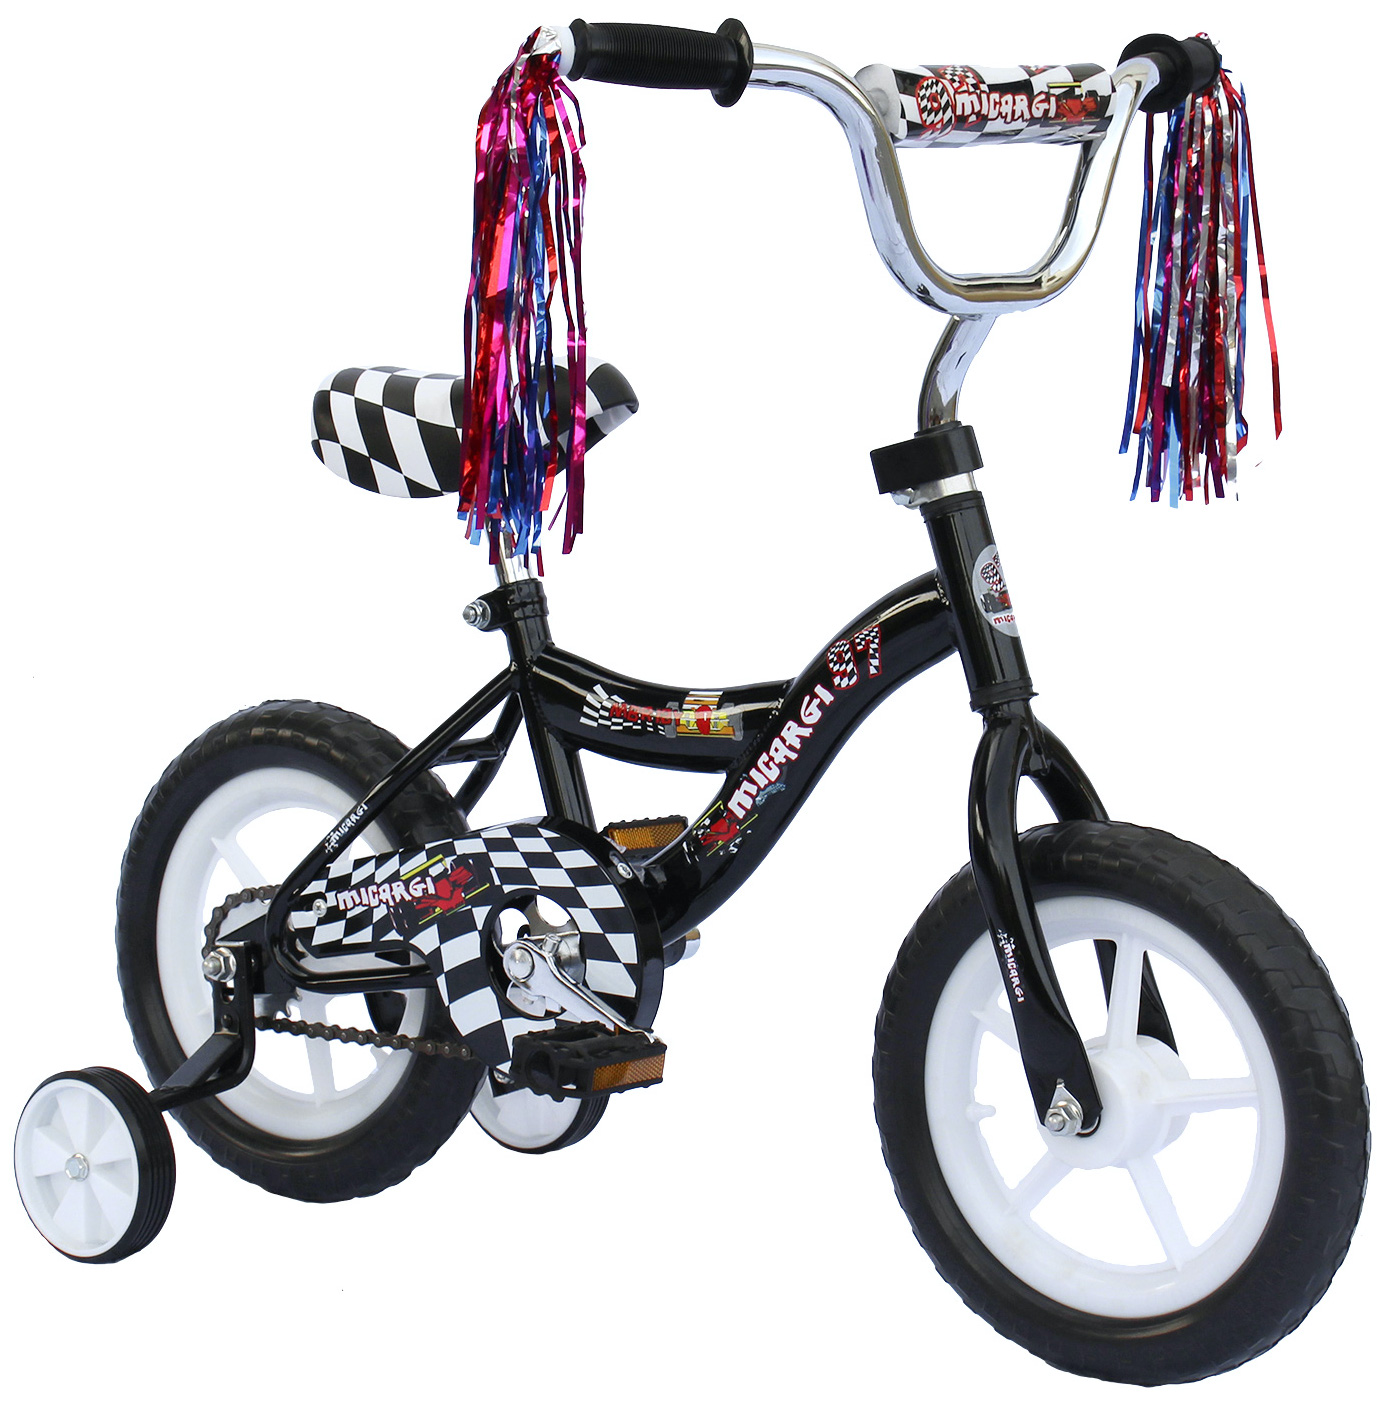 BLACK BMX BIKE SEAT CLAMP BICYCLE BIKE PARTS 369